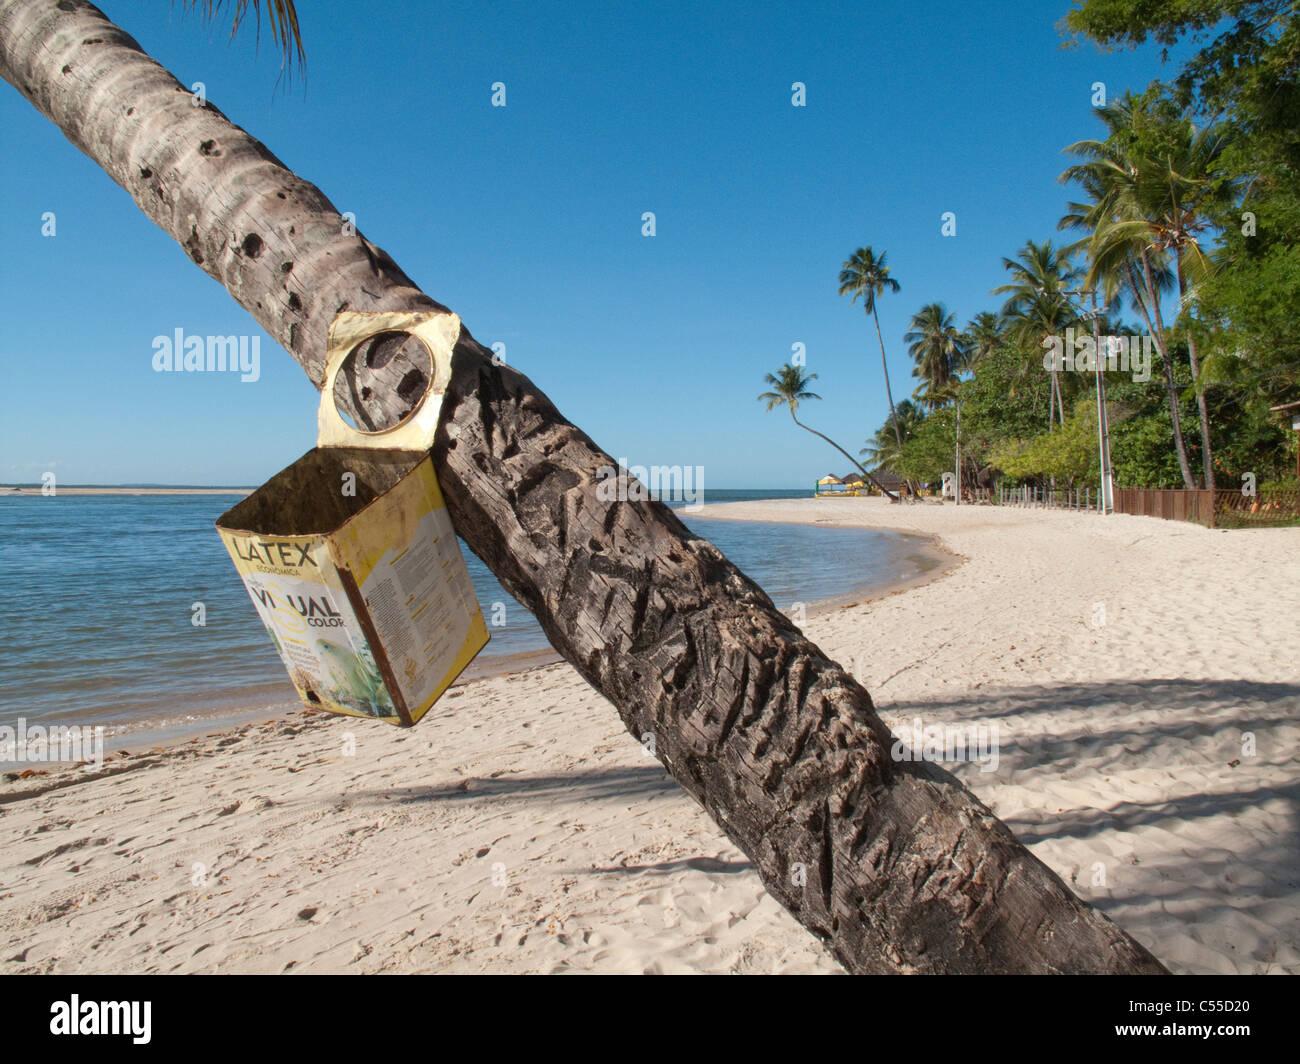 Litter bin hanging from palm tree on beach at Boipeba Island, Bahia, Brazil - Stock Image